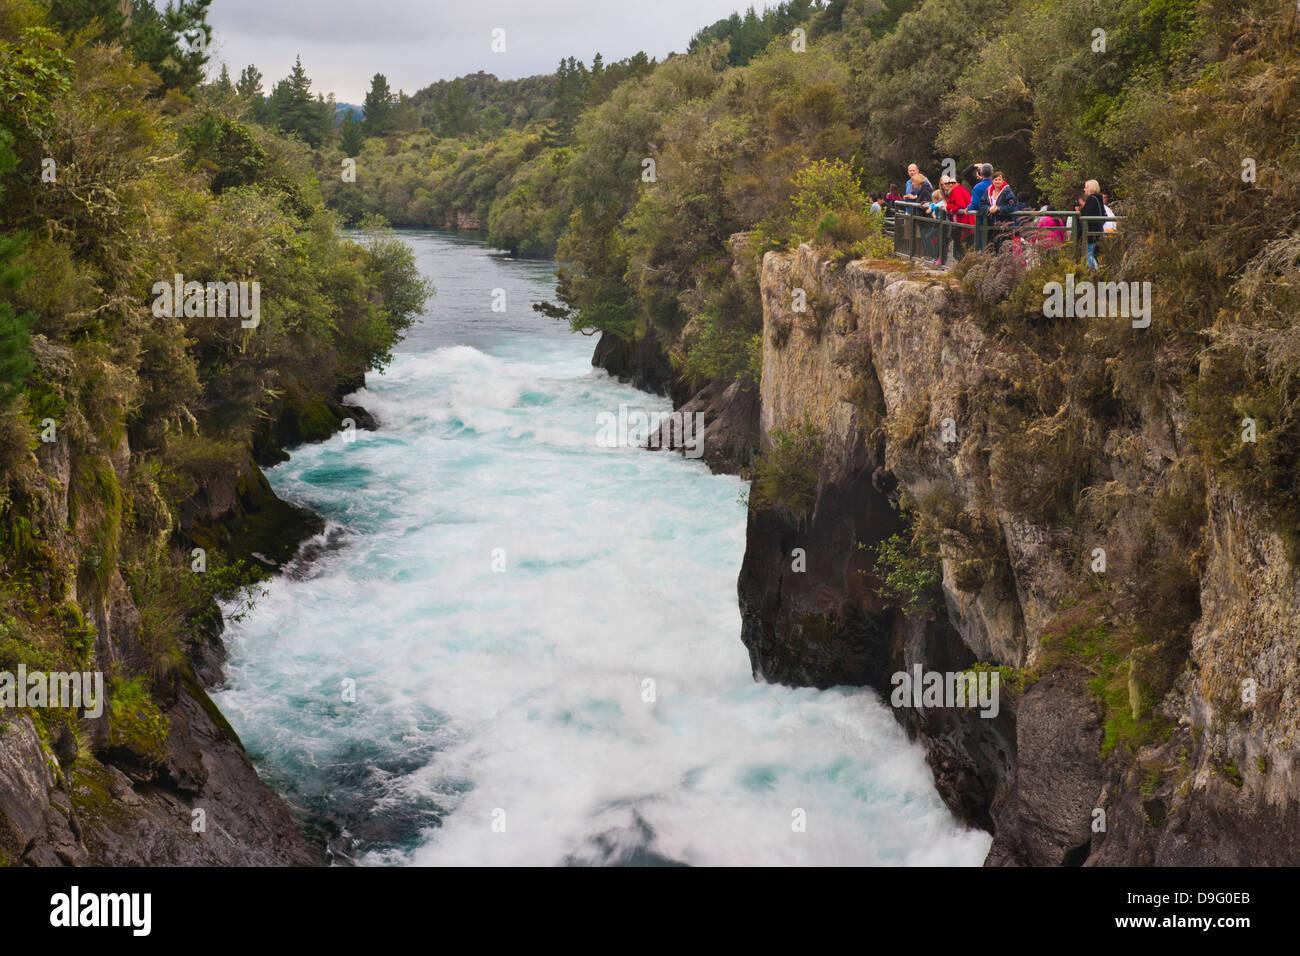 Tourists visiting Huka Falls, Taupo, Waikato Region, North Island, New Zealand - Stock Image